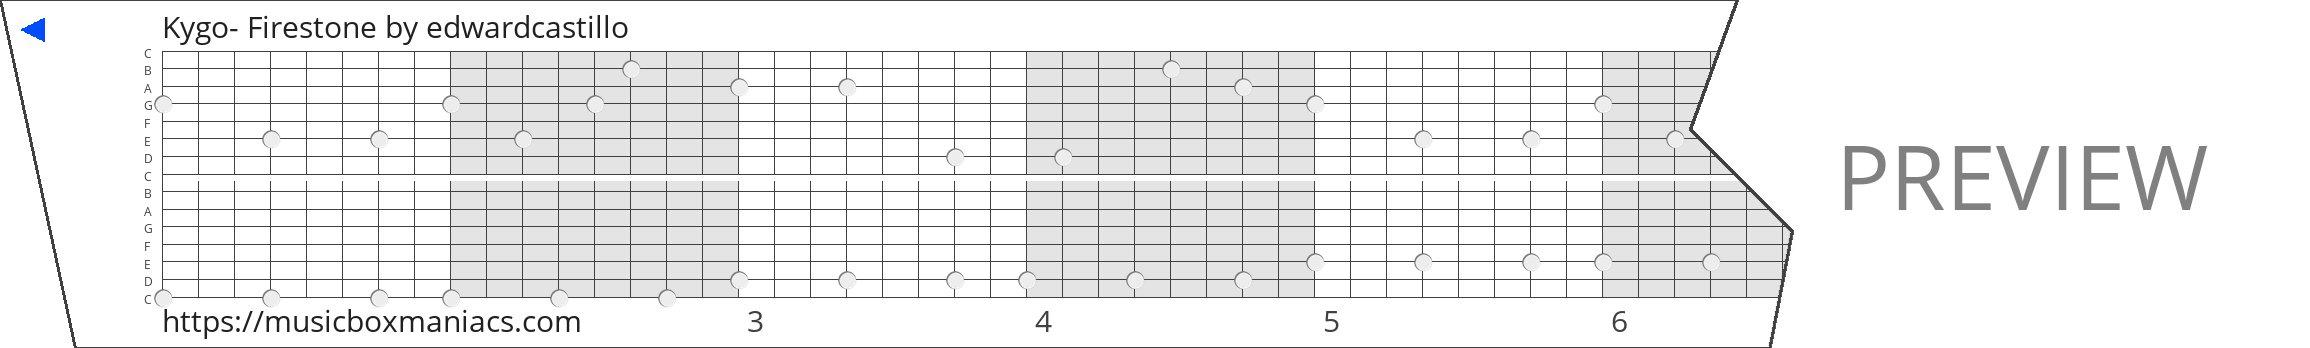 Kygo- Firestone 15 note music box paper strip